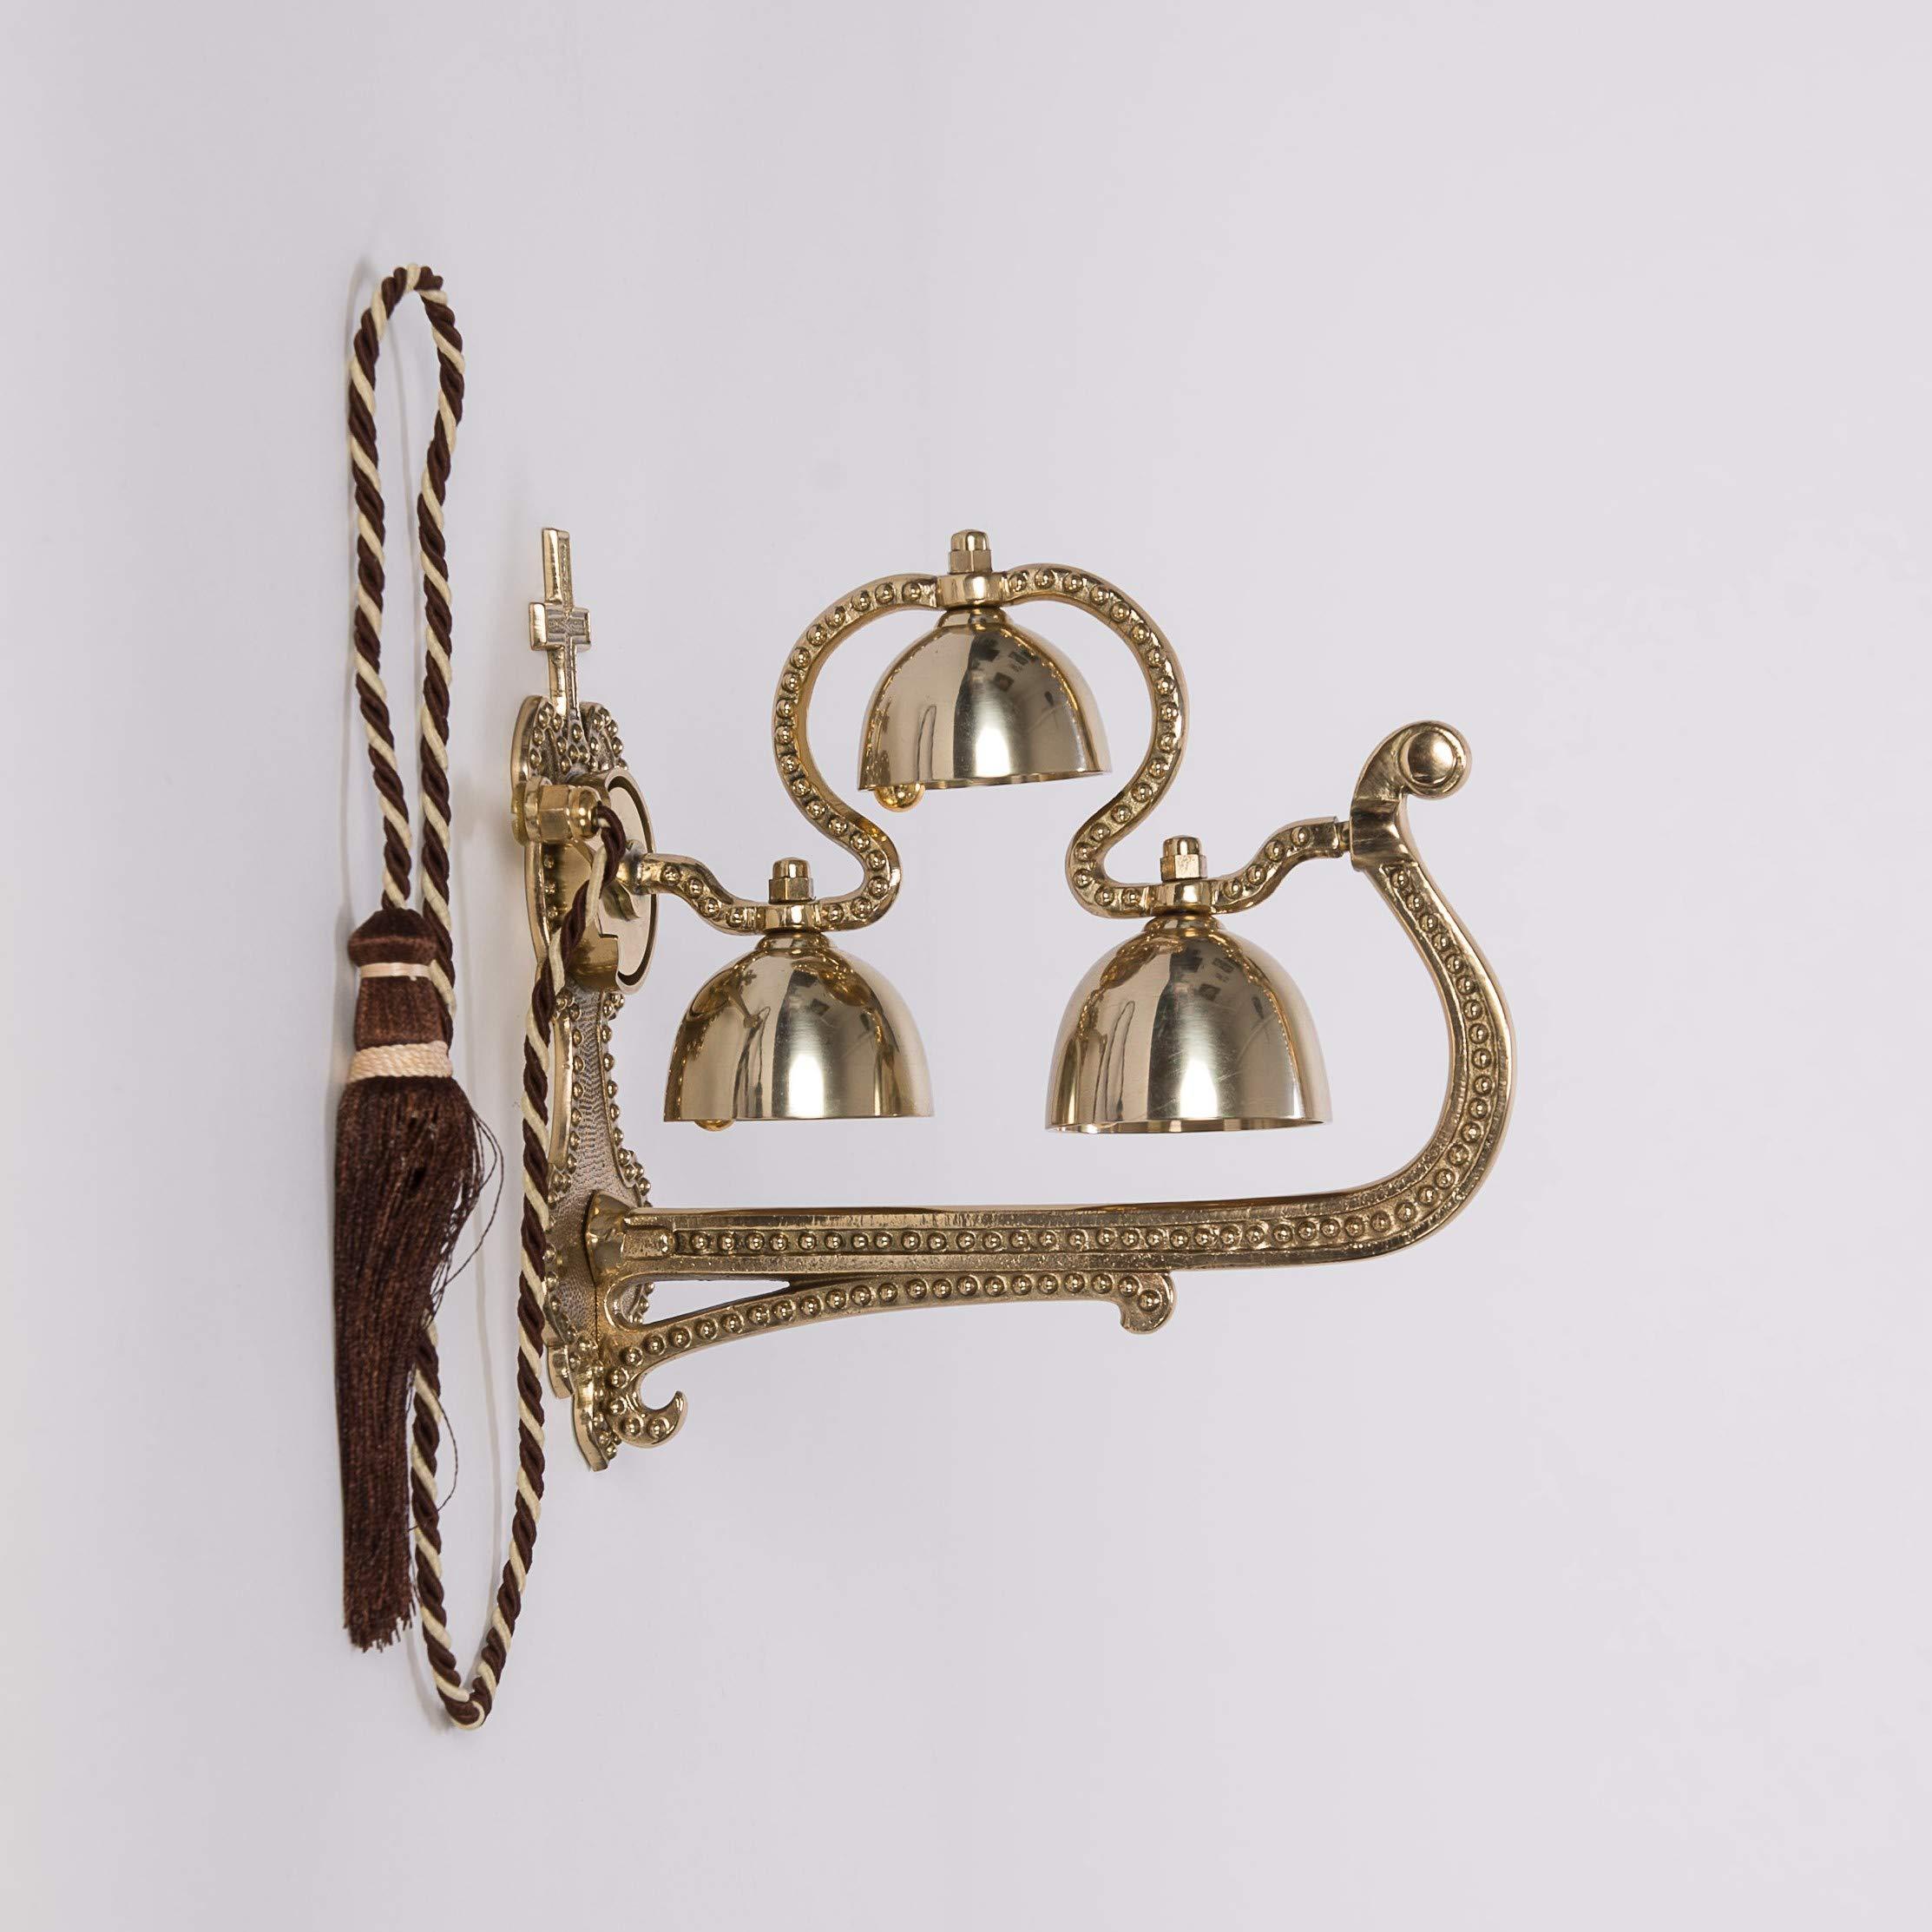 Triple Wall Hung Sacristy Bell - Church Bell - Altar Bell - Communion Bell - Sanctus Bell - Chalice (CCG-85)